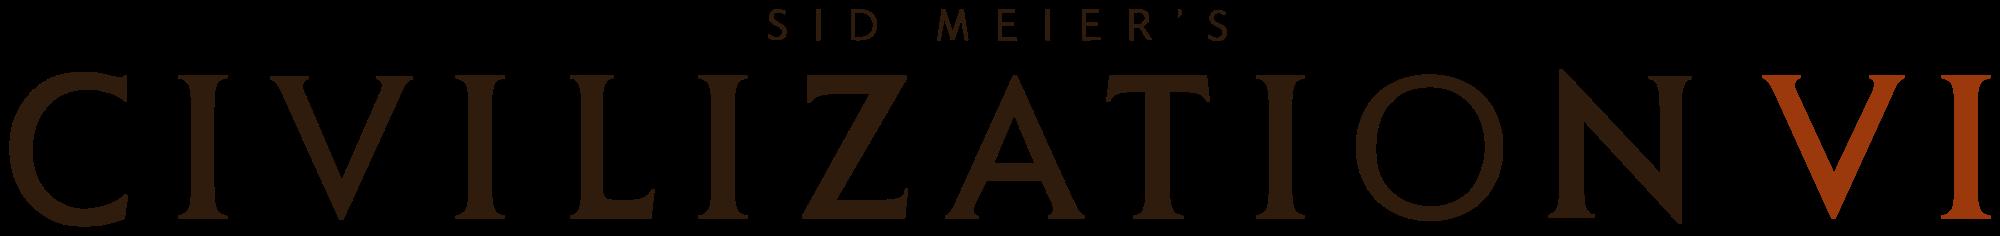 Civilization VI logo png